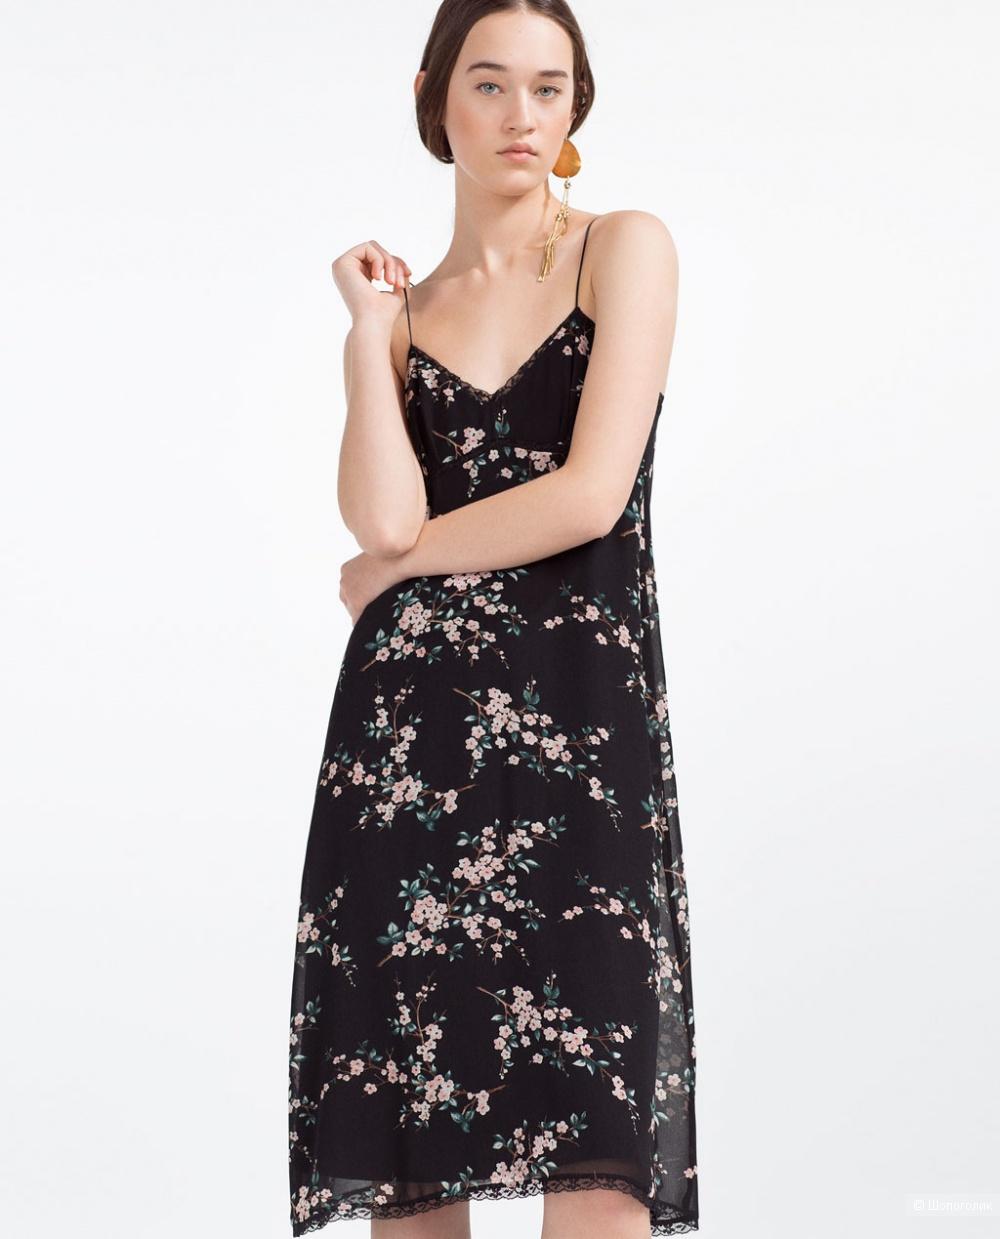 Платье-комбинация Zara размер S/М